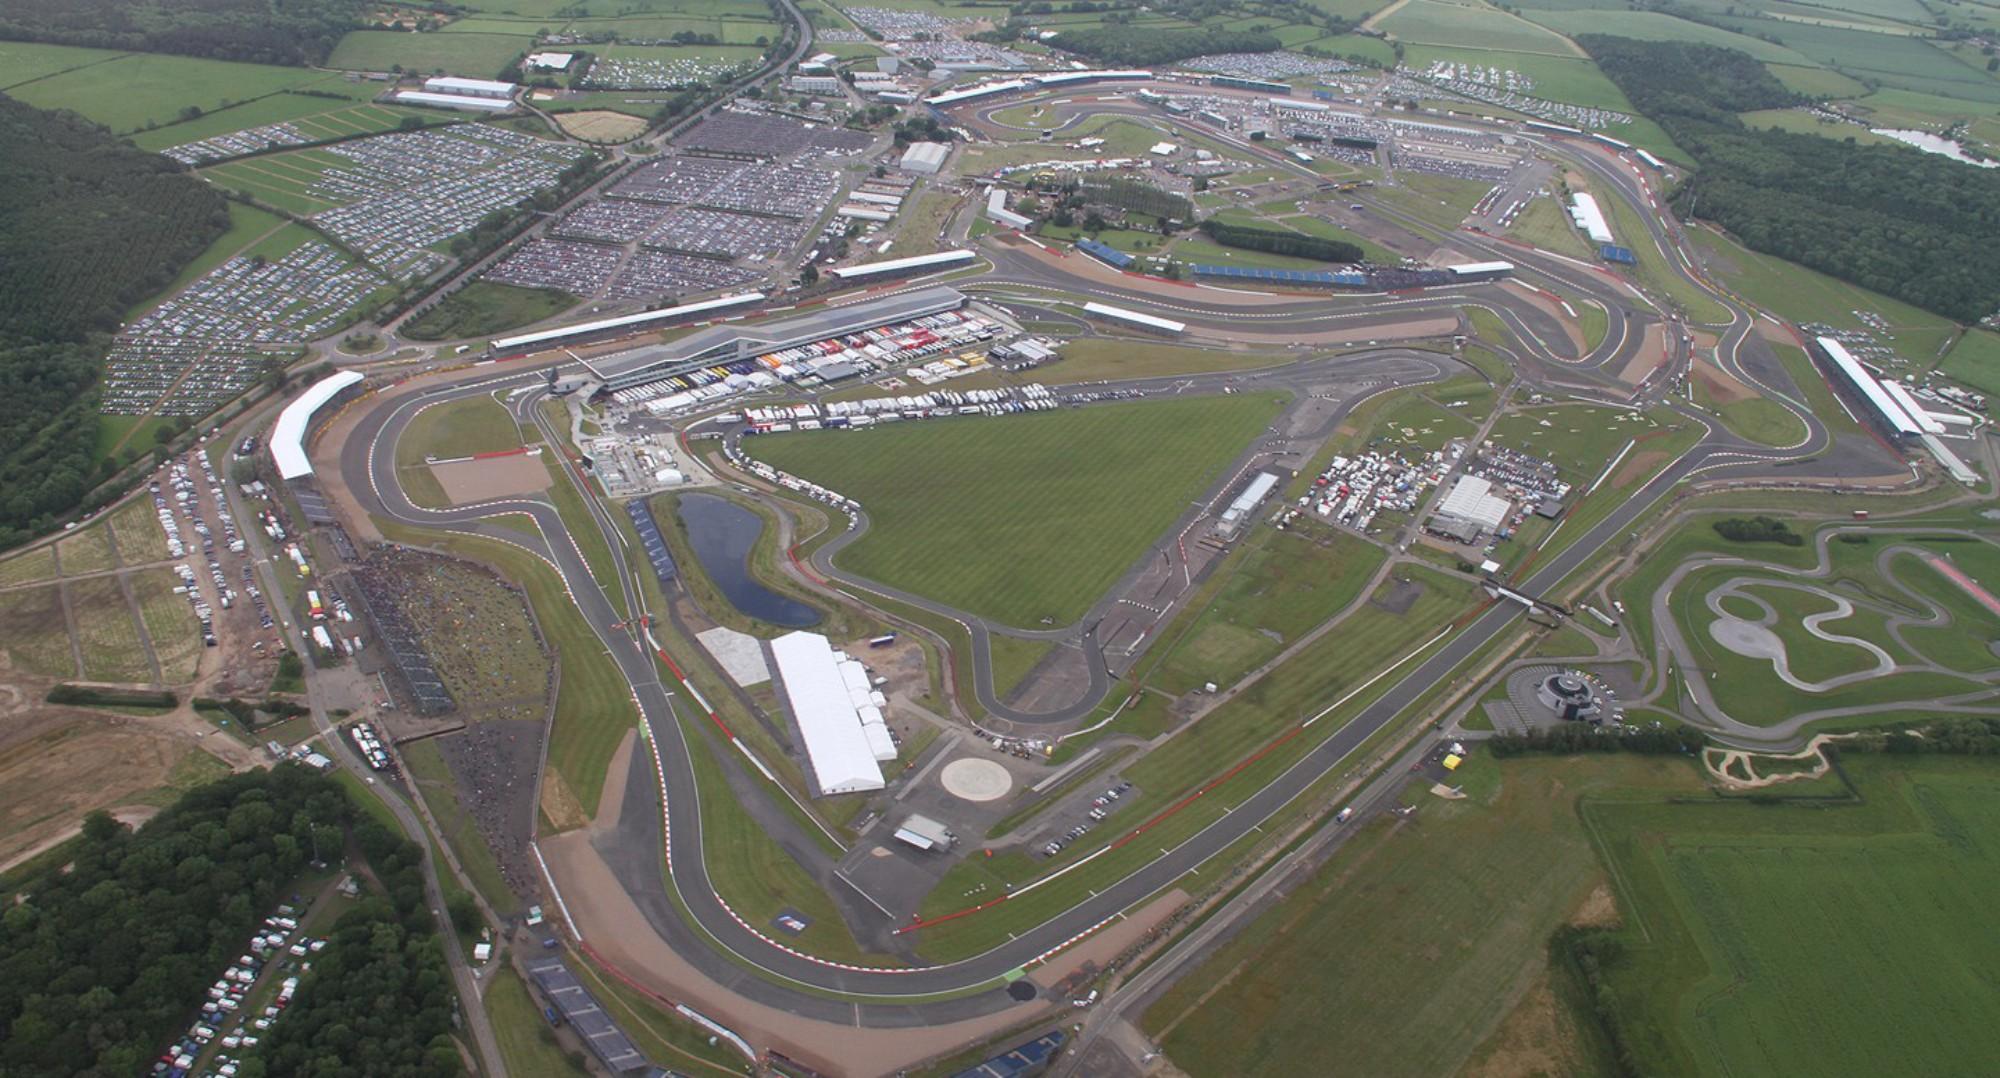 image from Гран При Англии 2021